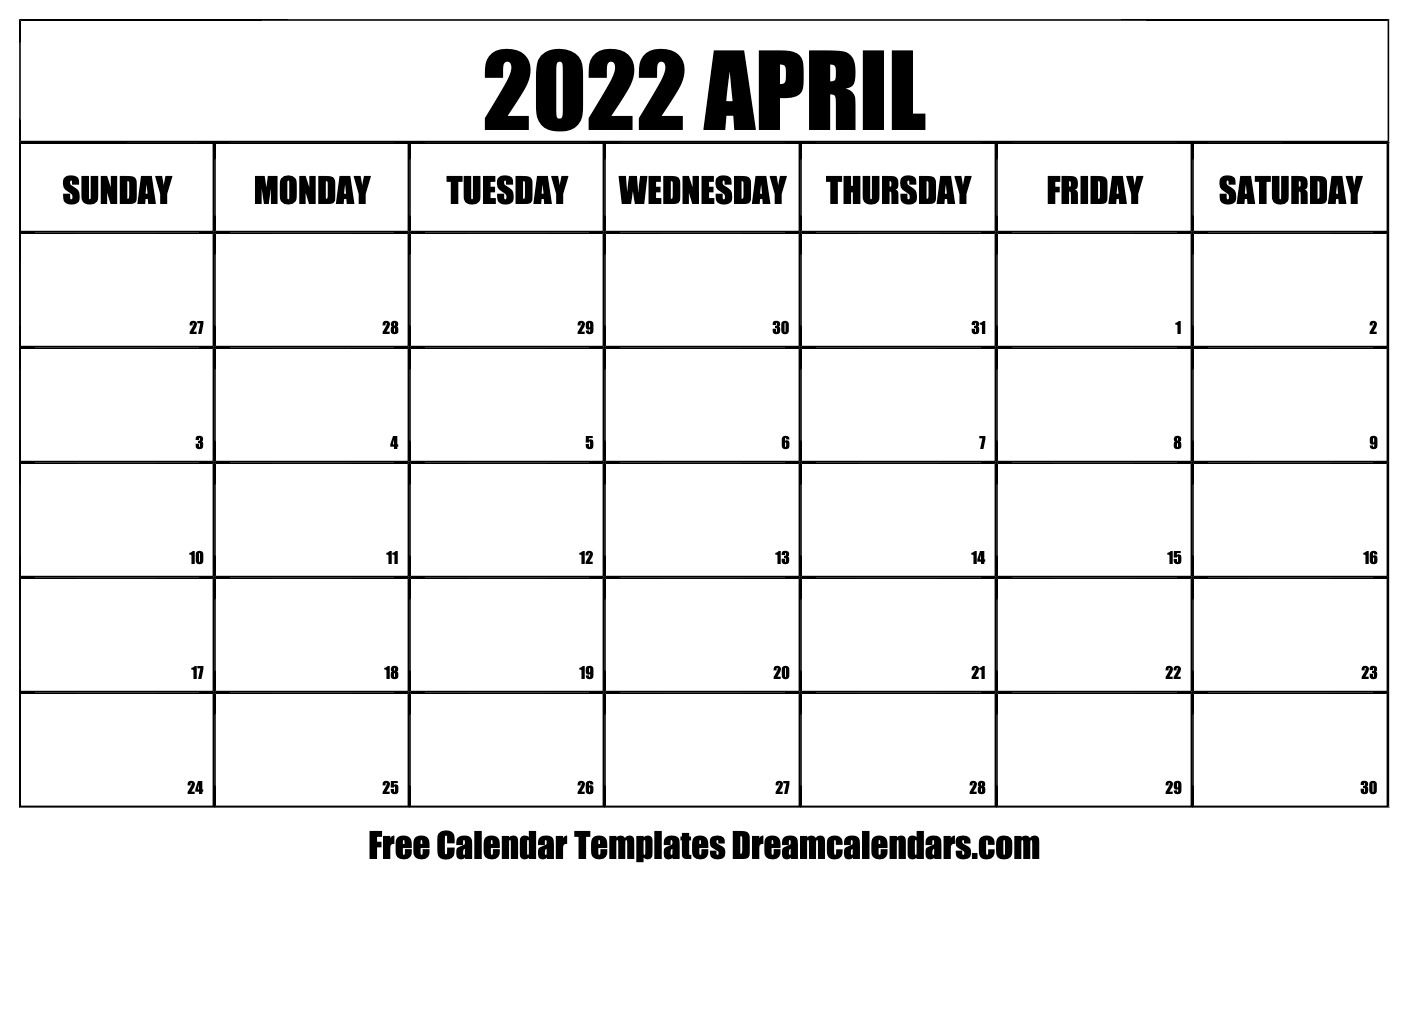 April 2022 Calendar | Free Blank Printable Templates